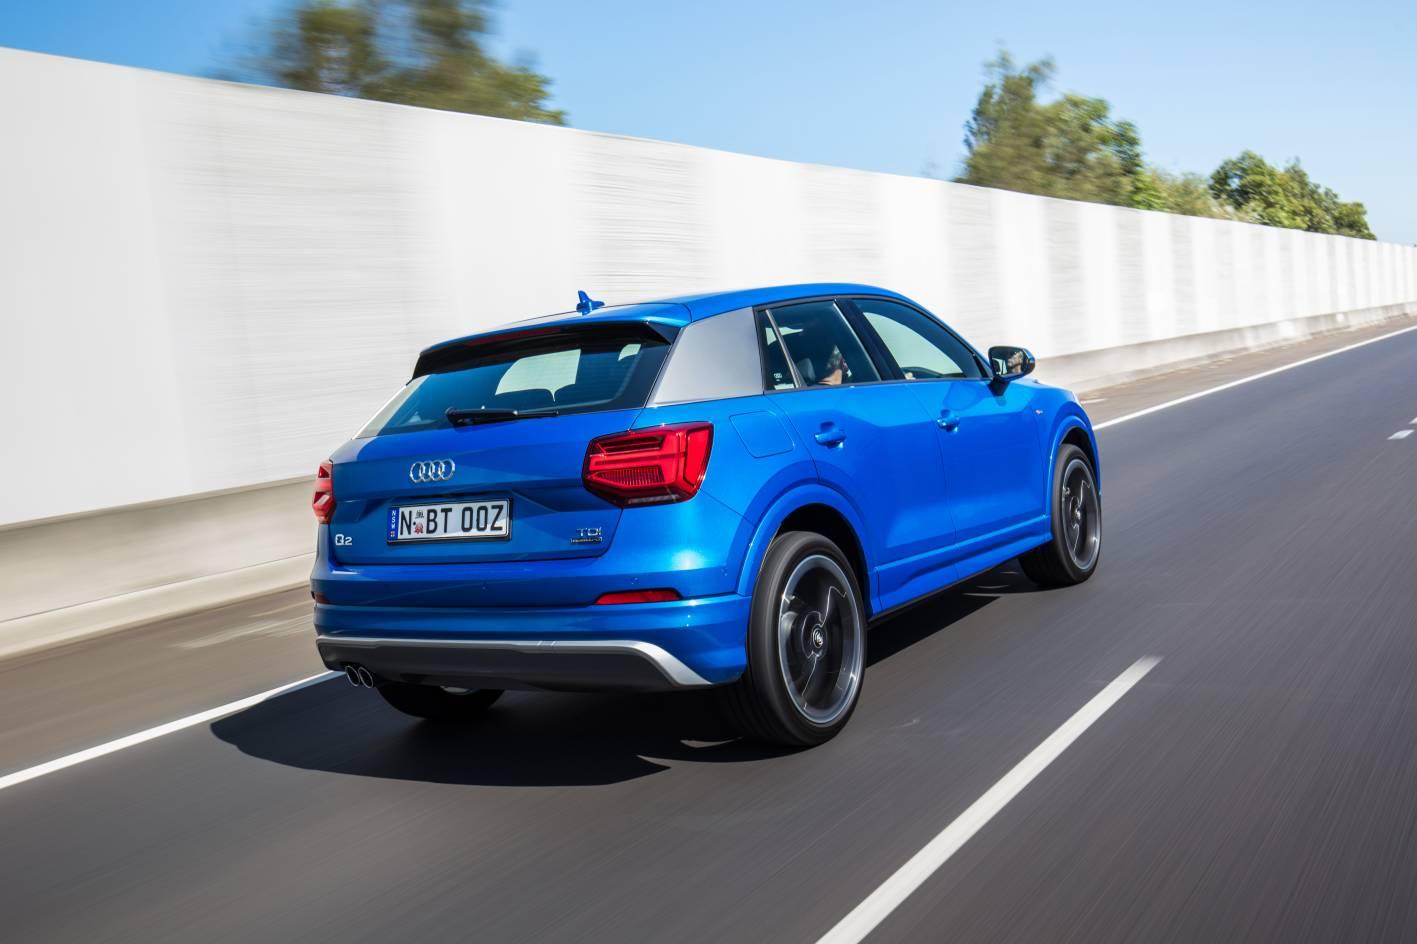 Two-tier Audi Q2 range kicks off from $41,100 - ForceGT.com